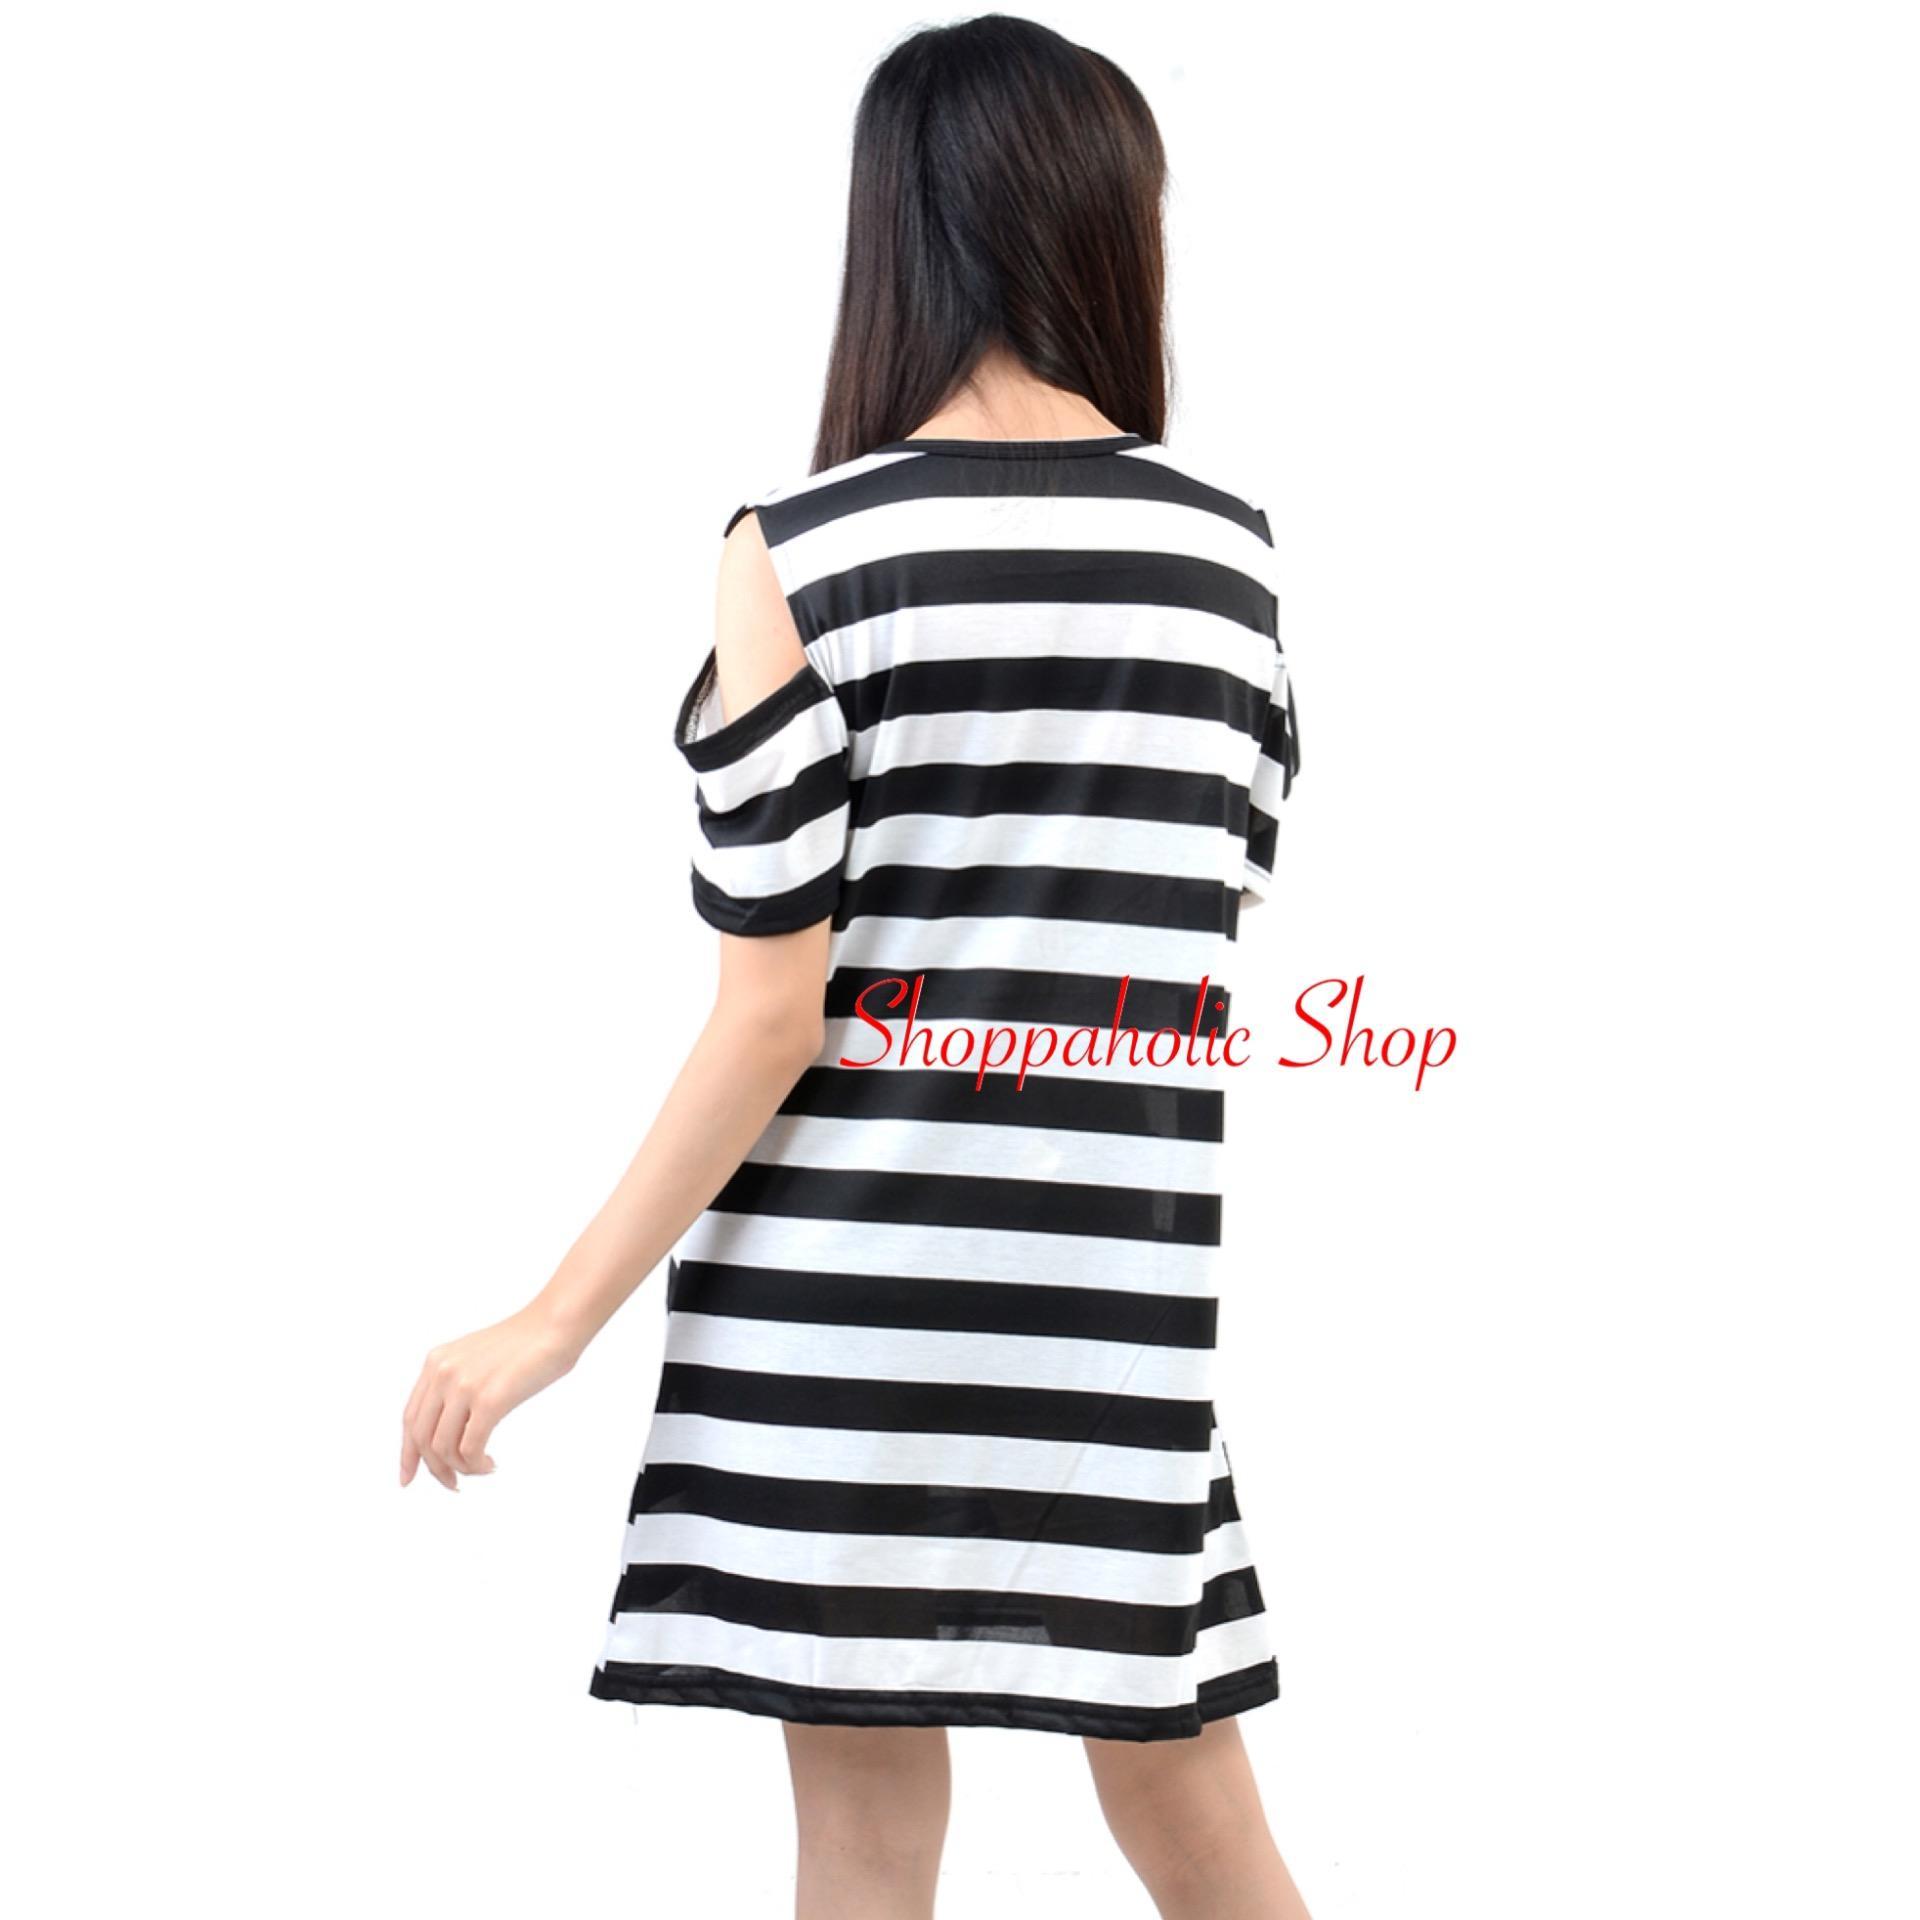 Shoppaholic Shop Dress Wanita Elisa Salur